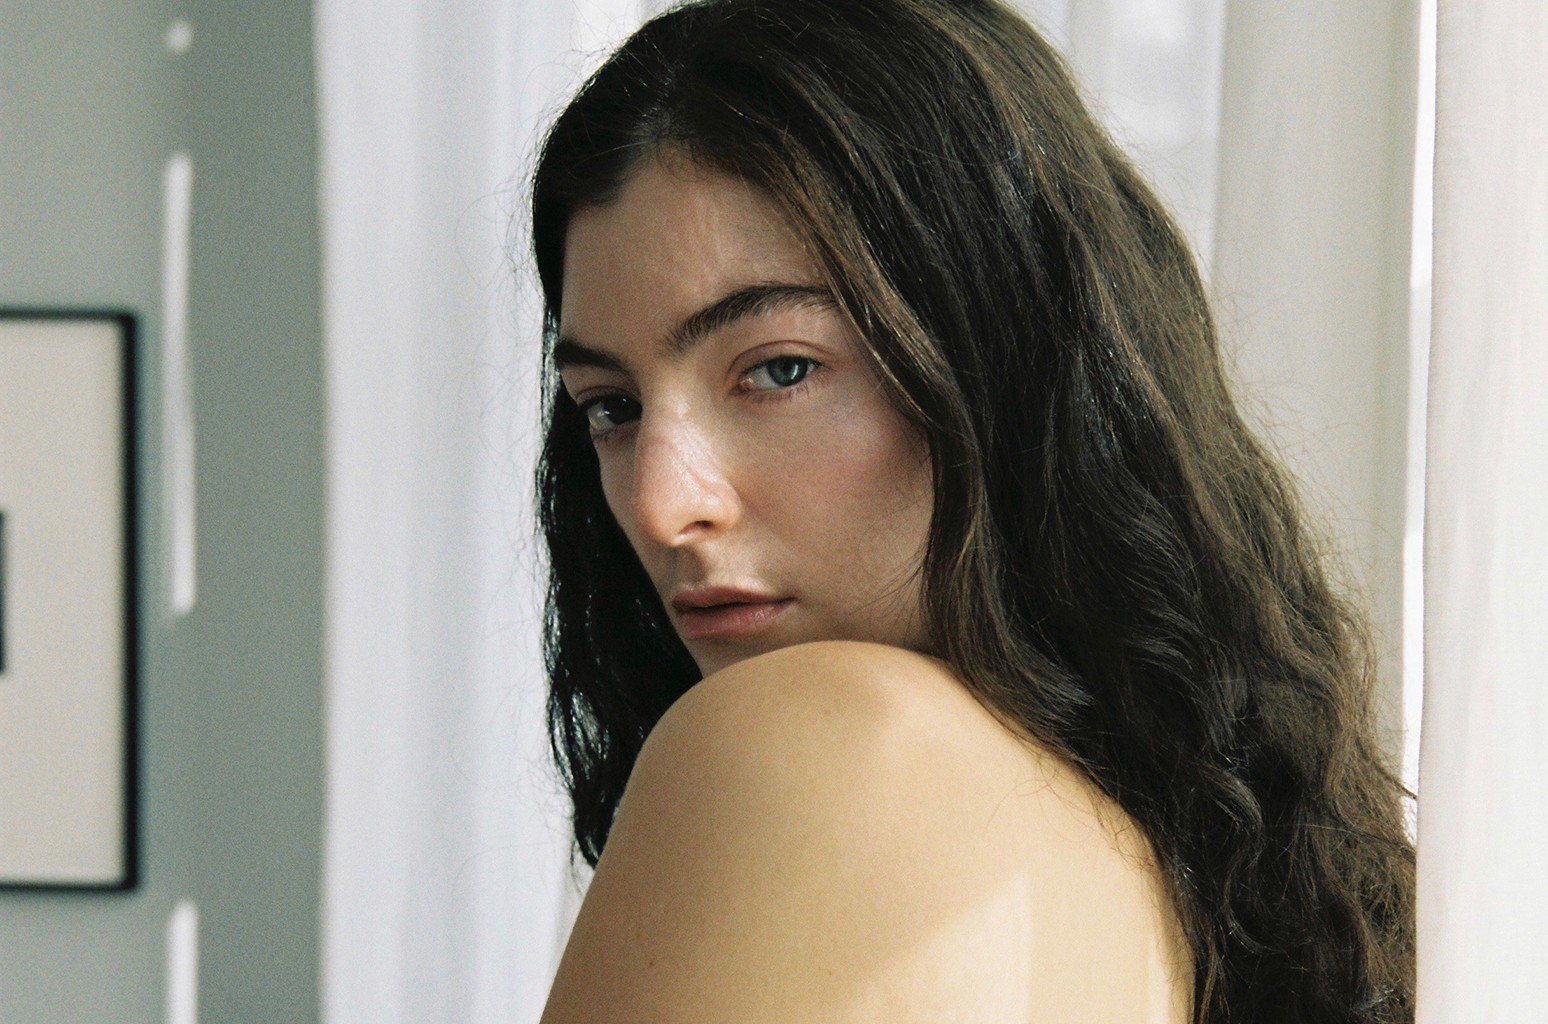 Lorde 2021 Music Trajectory